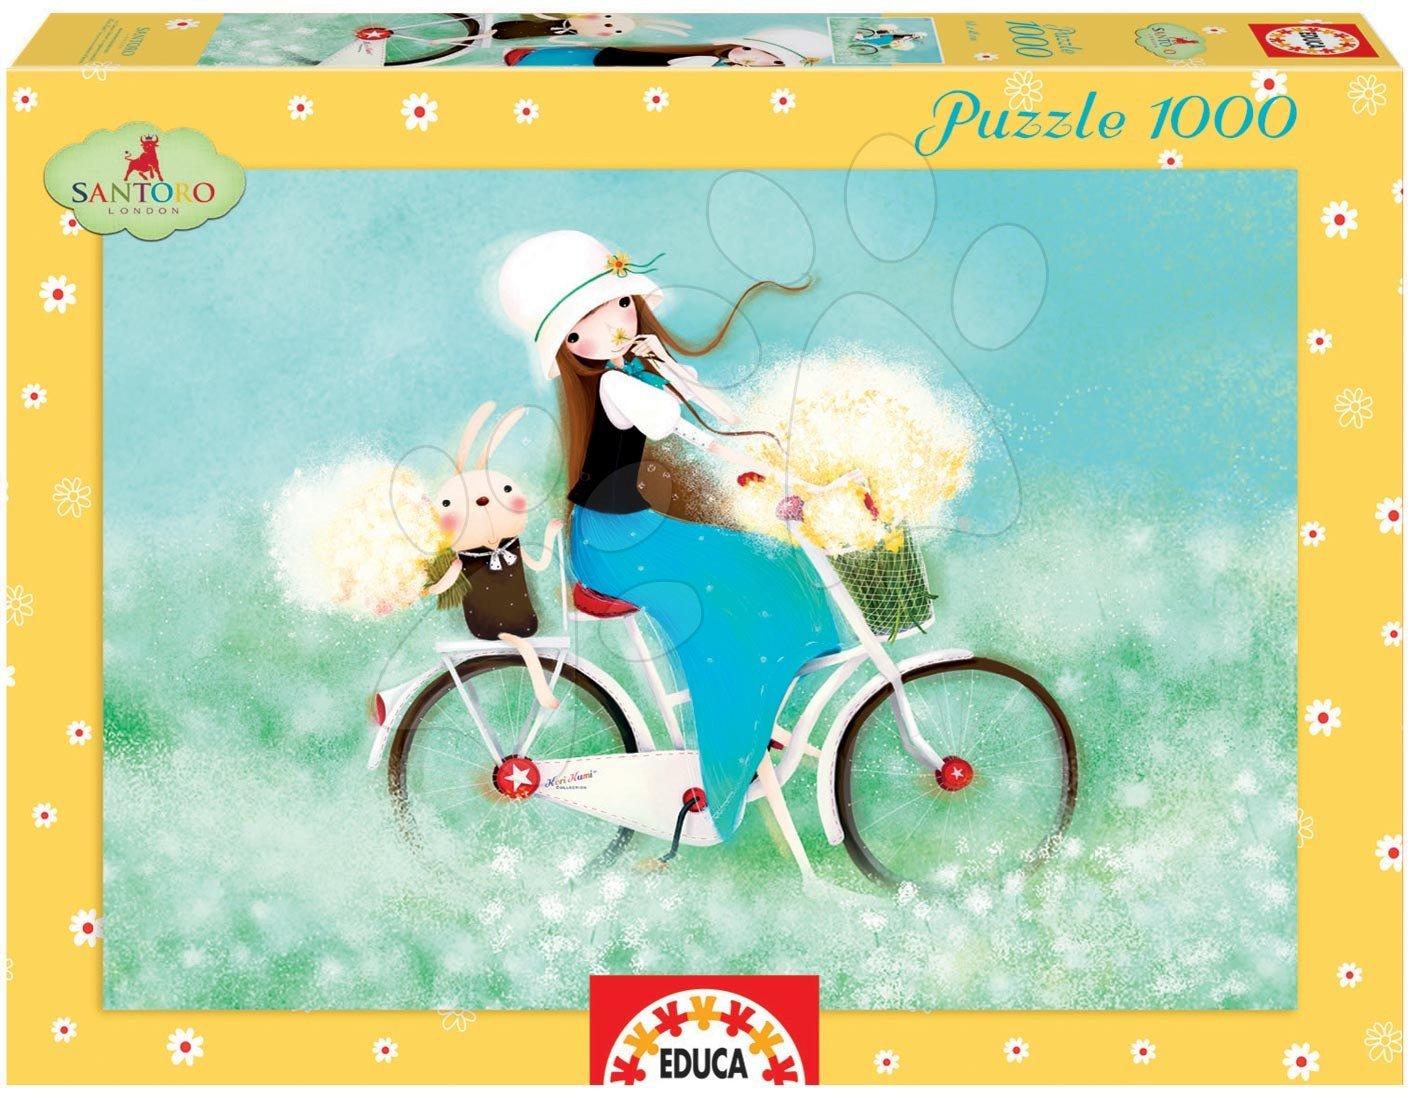 Puzzle 1000 dielne - Puzzle Kori Kumi Summertime, Santoro Educa 1000 dielov od 12 rokov